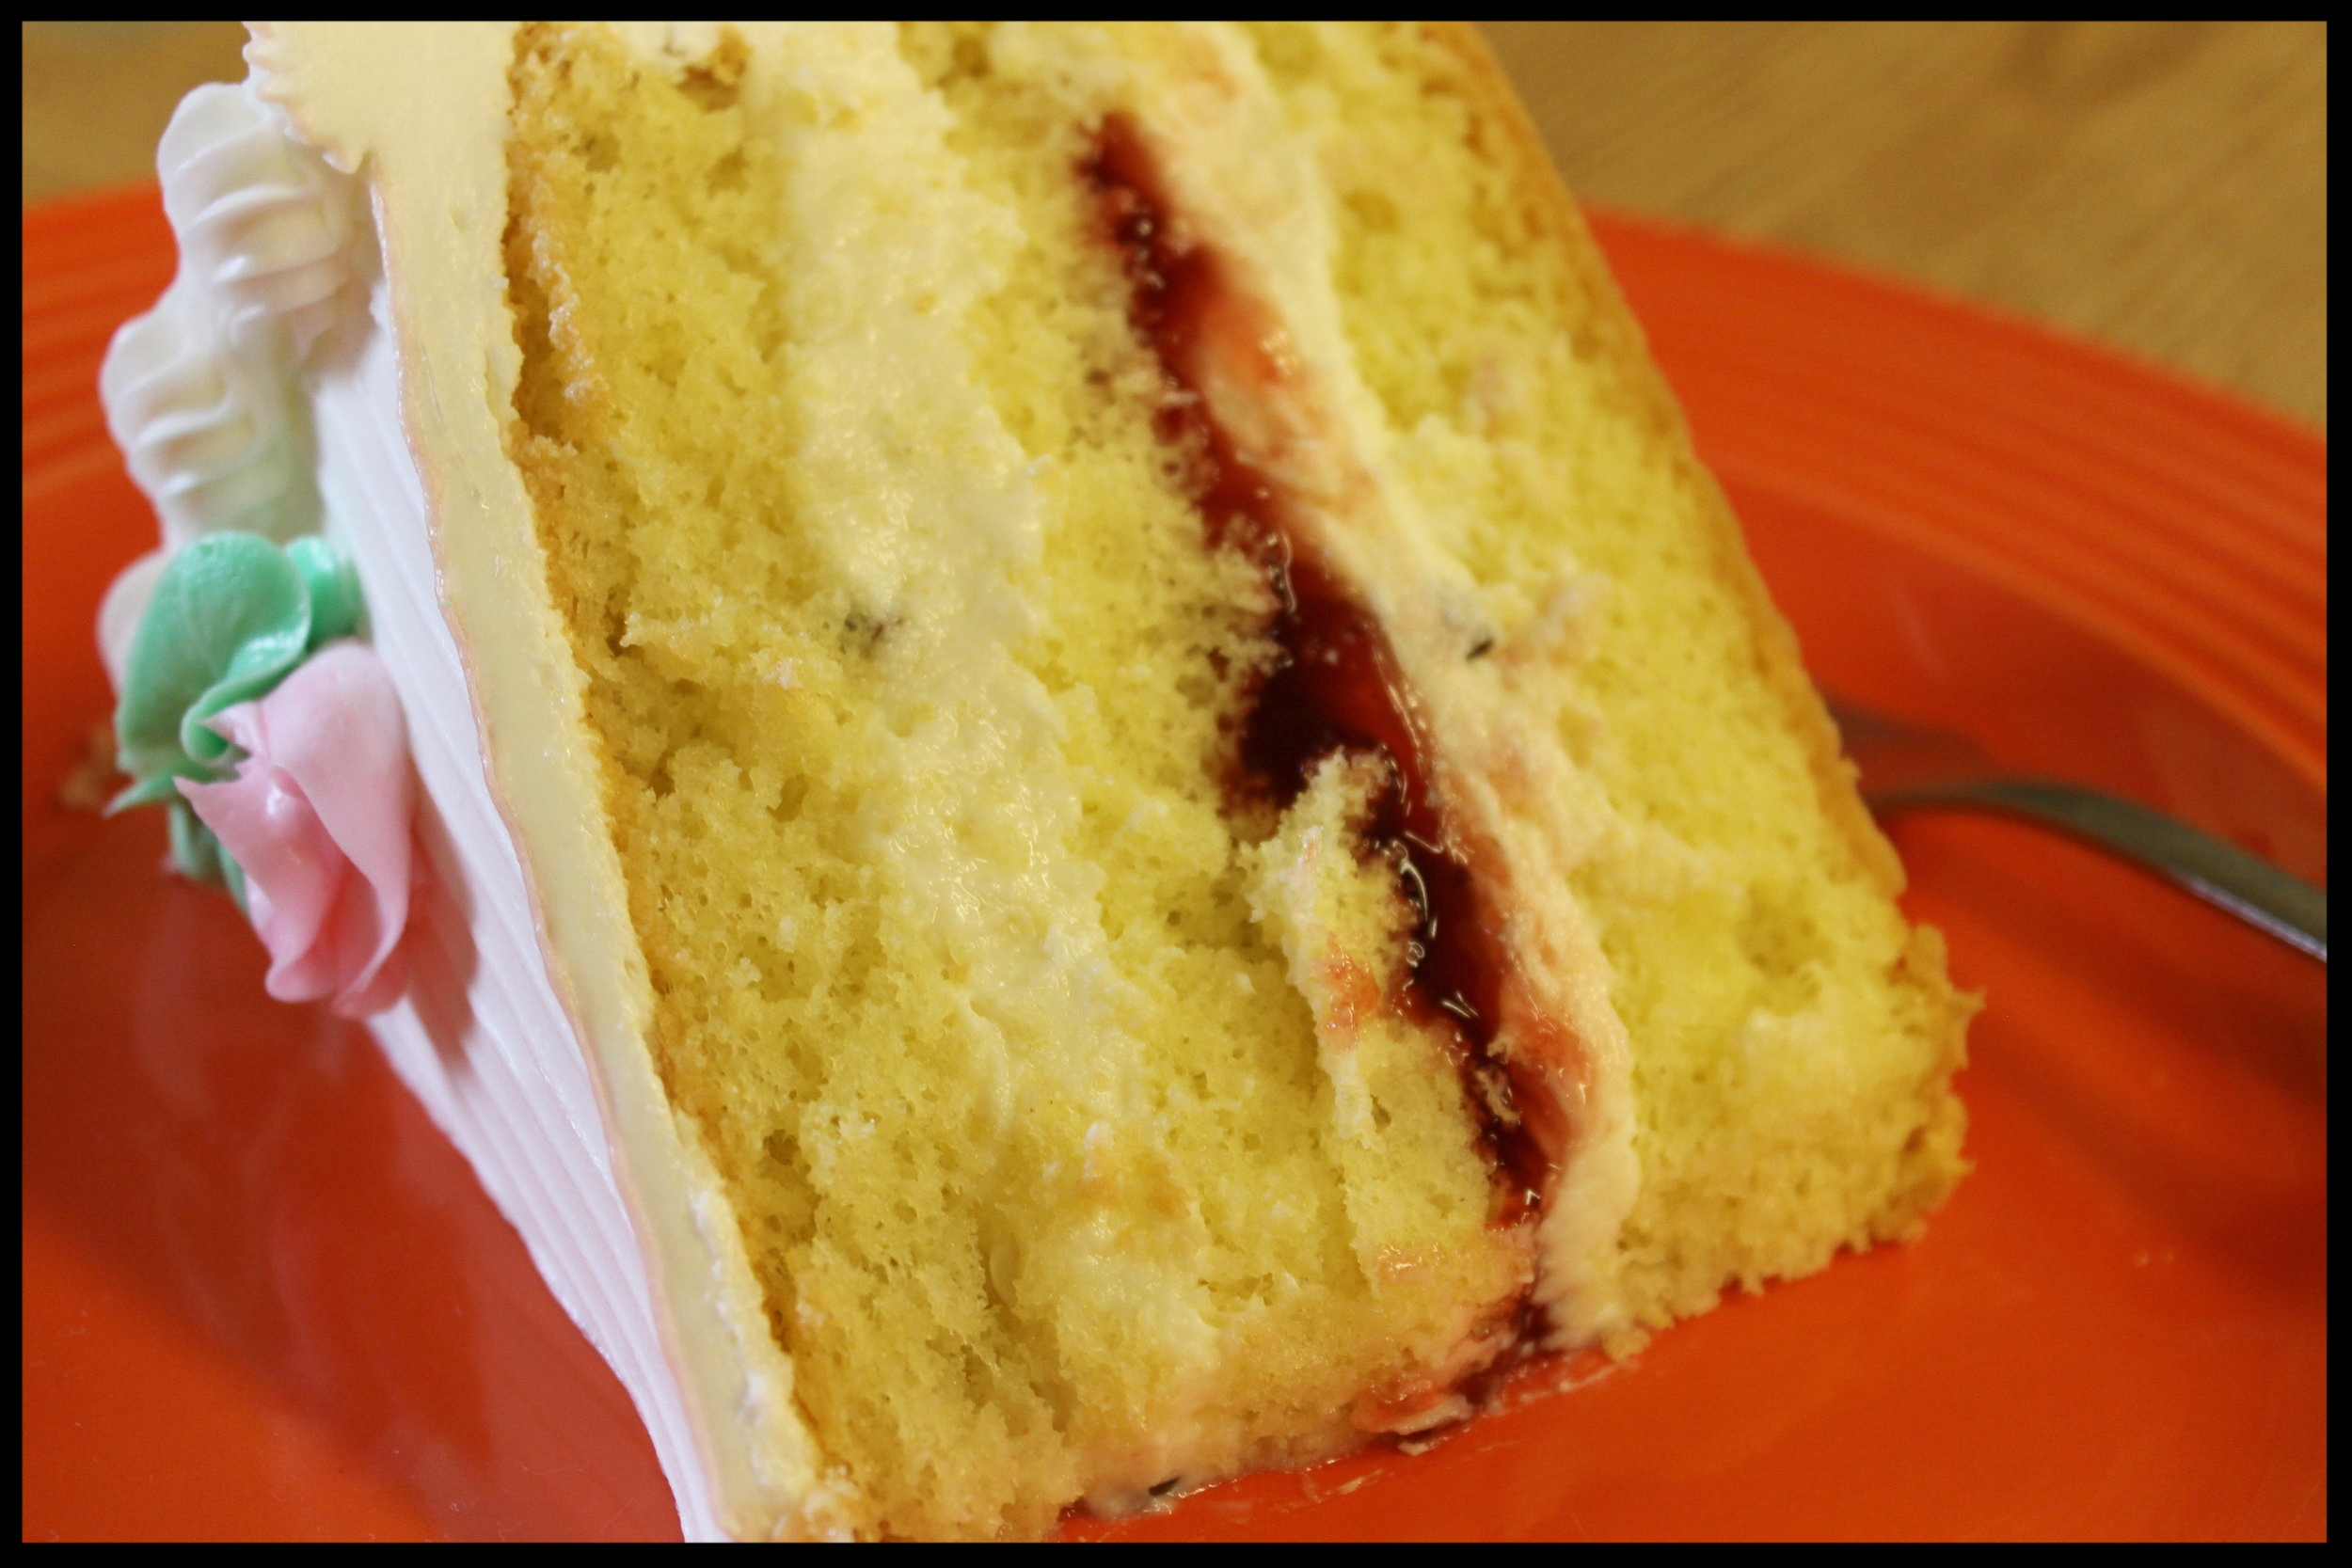 Vanilla Cannoli Slice - Vanilla sponge cake with cannoli cheese and strawberry.